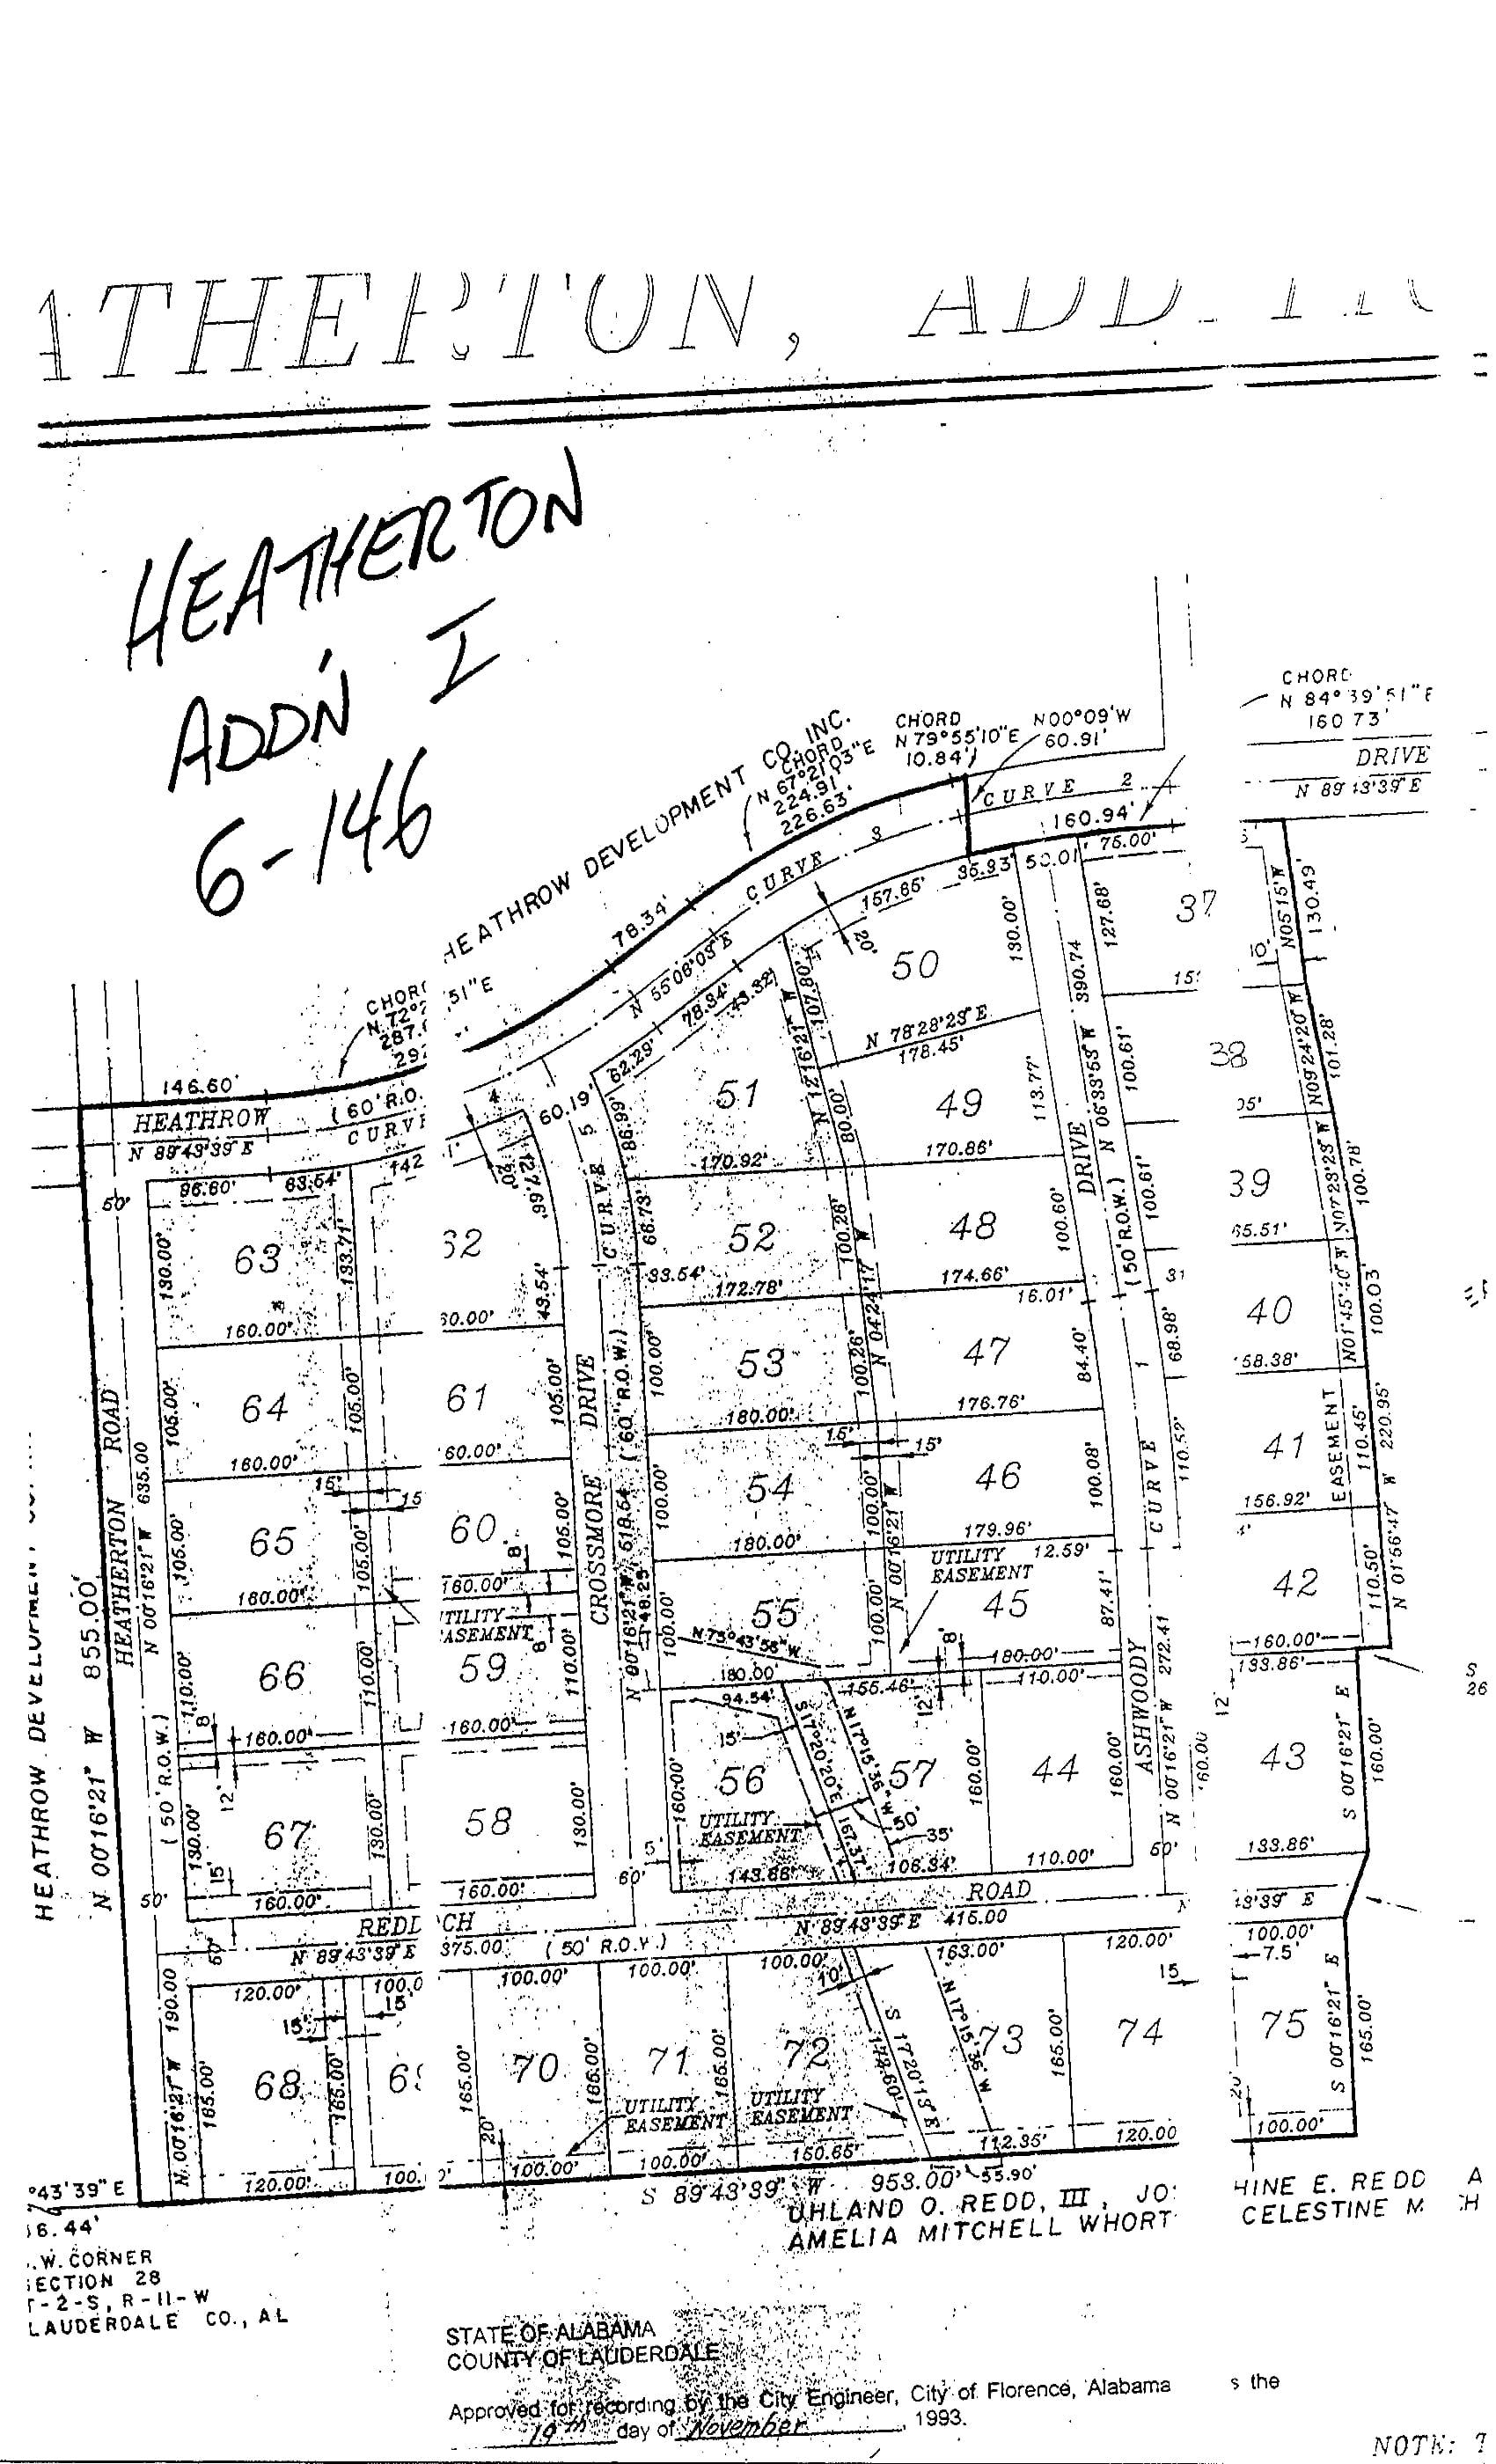 Plat-Heatherton-Addition-I-1.jpg